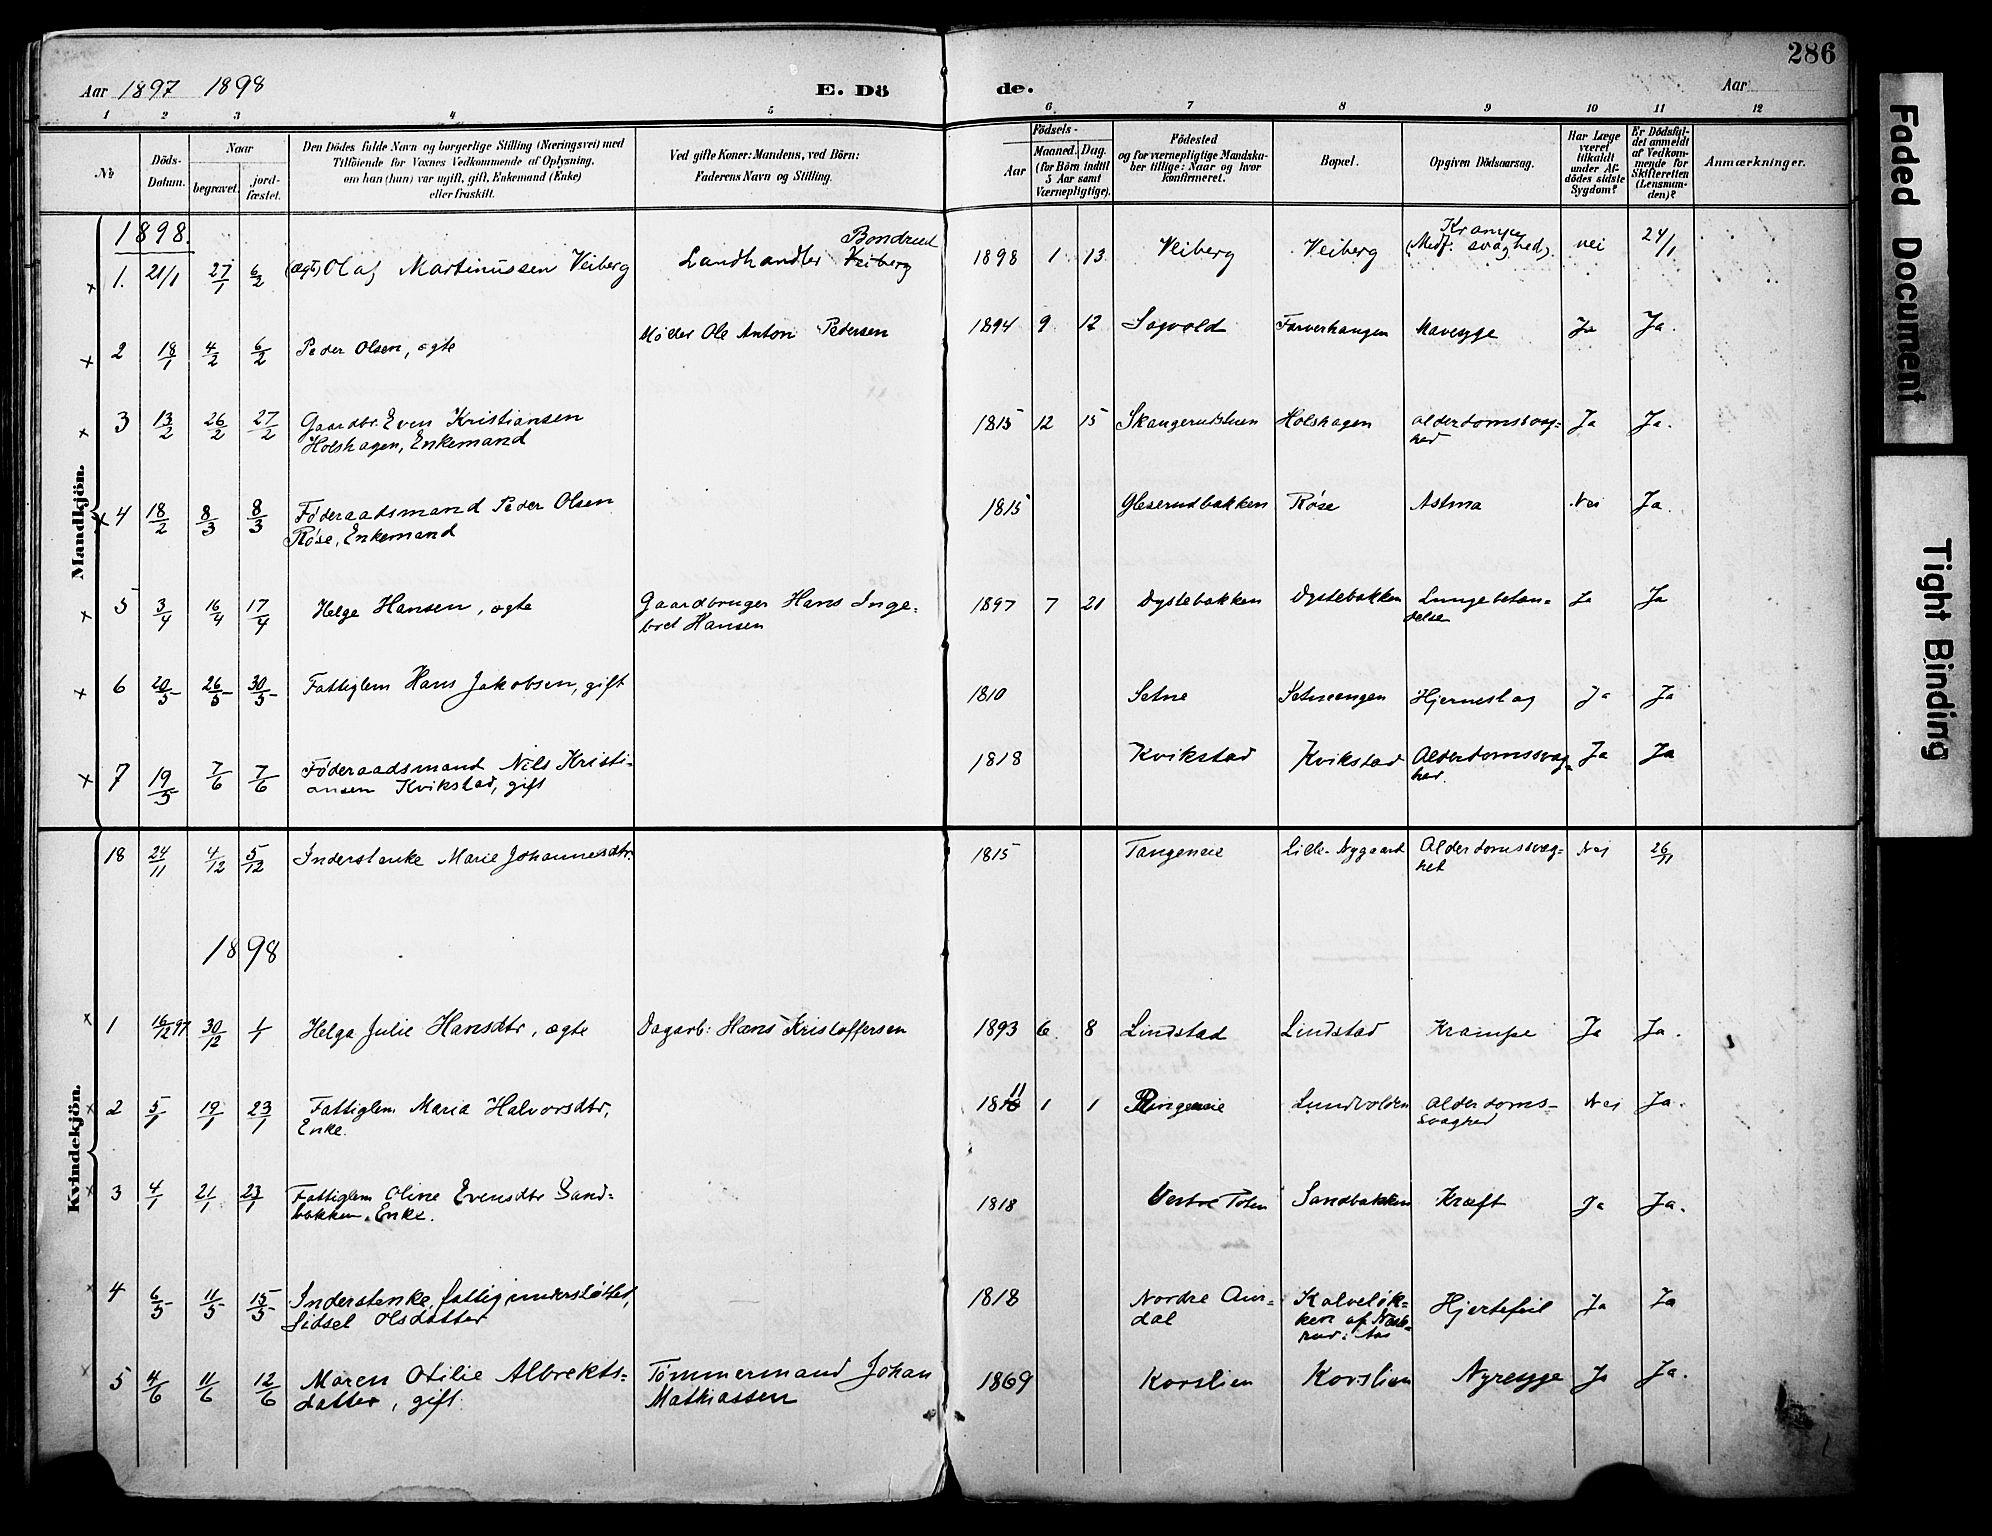 SAH, Vestre Toten prestekontor, H/Ha/Haa/L0013: Ministerialbok nr. 13, 1895-1911, s. 286